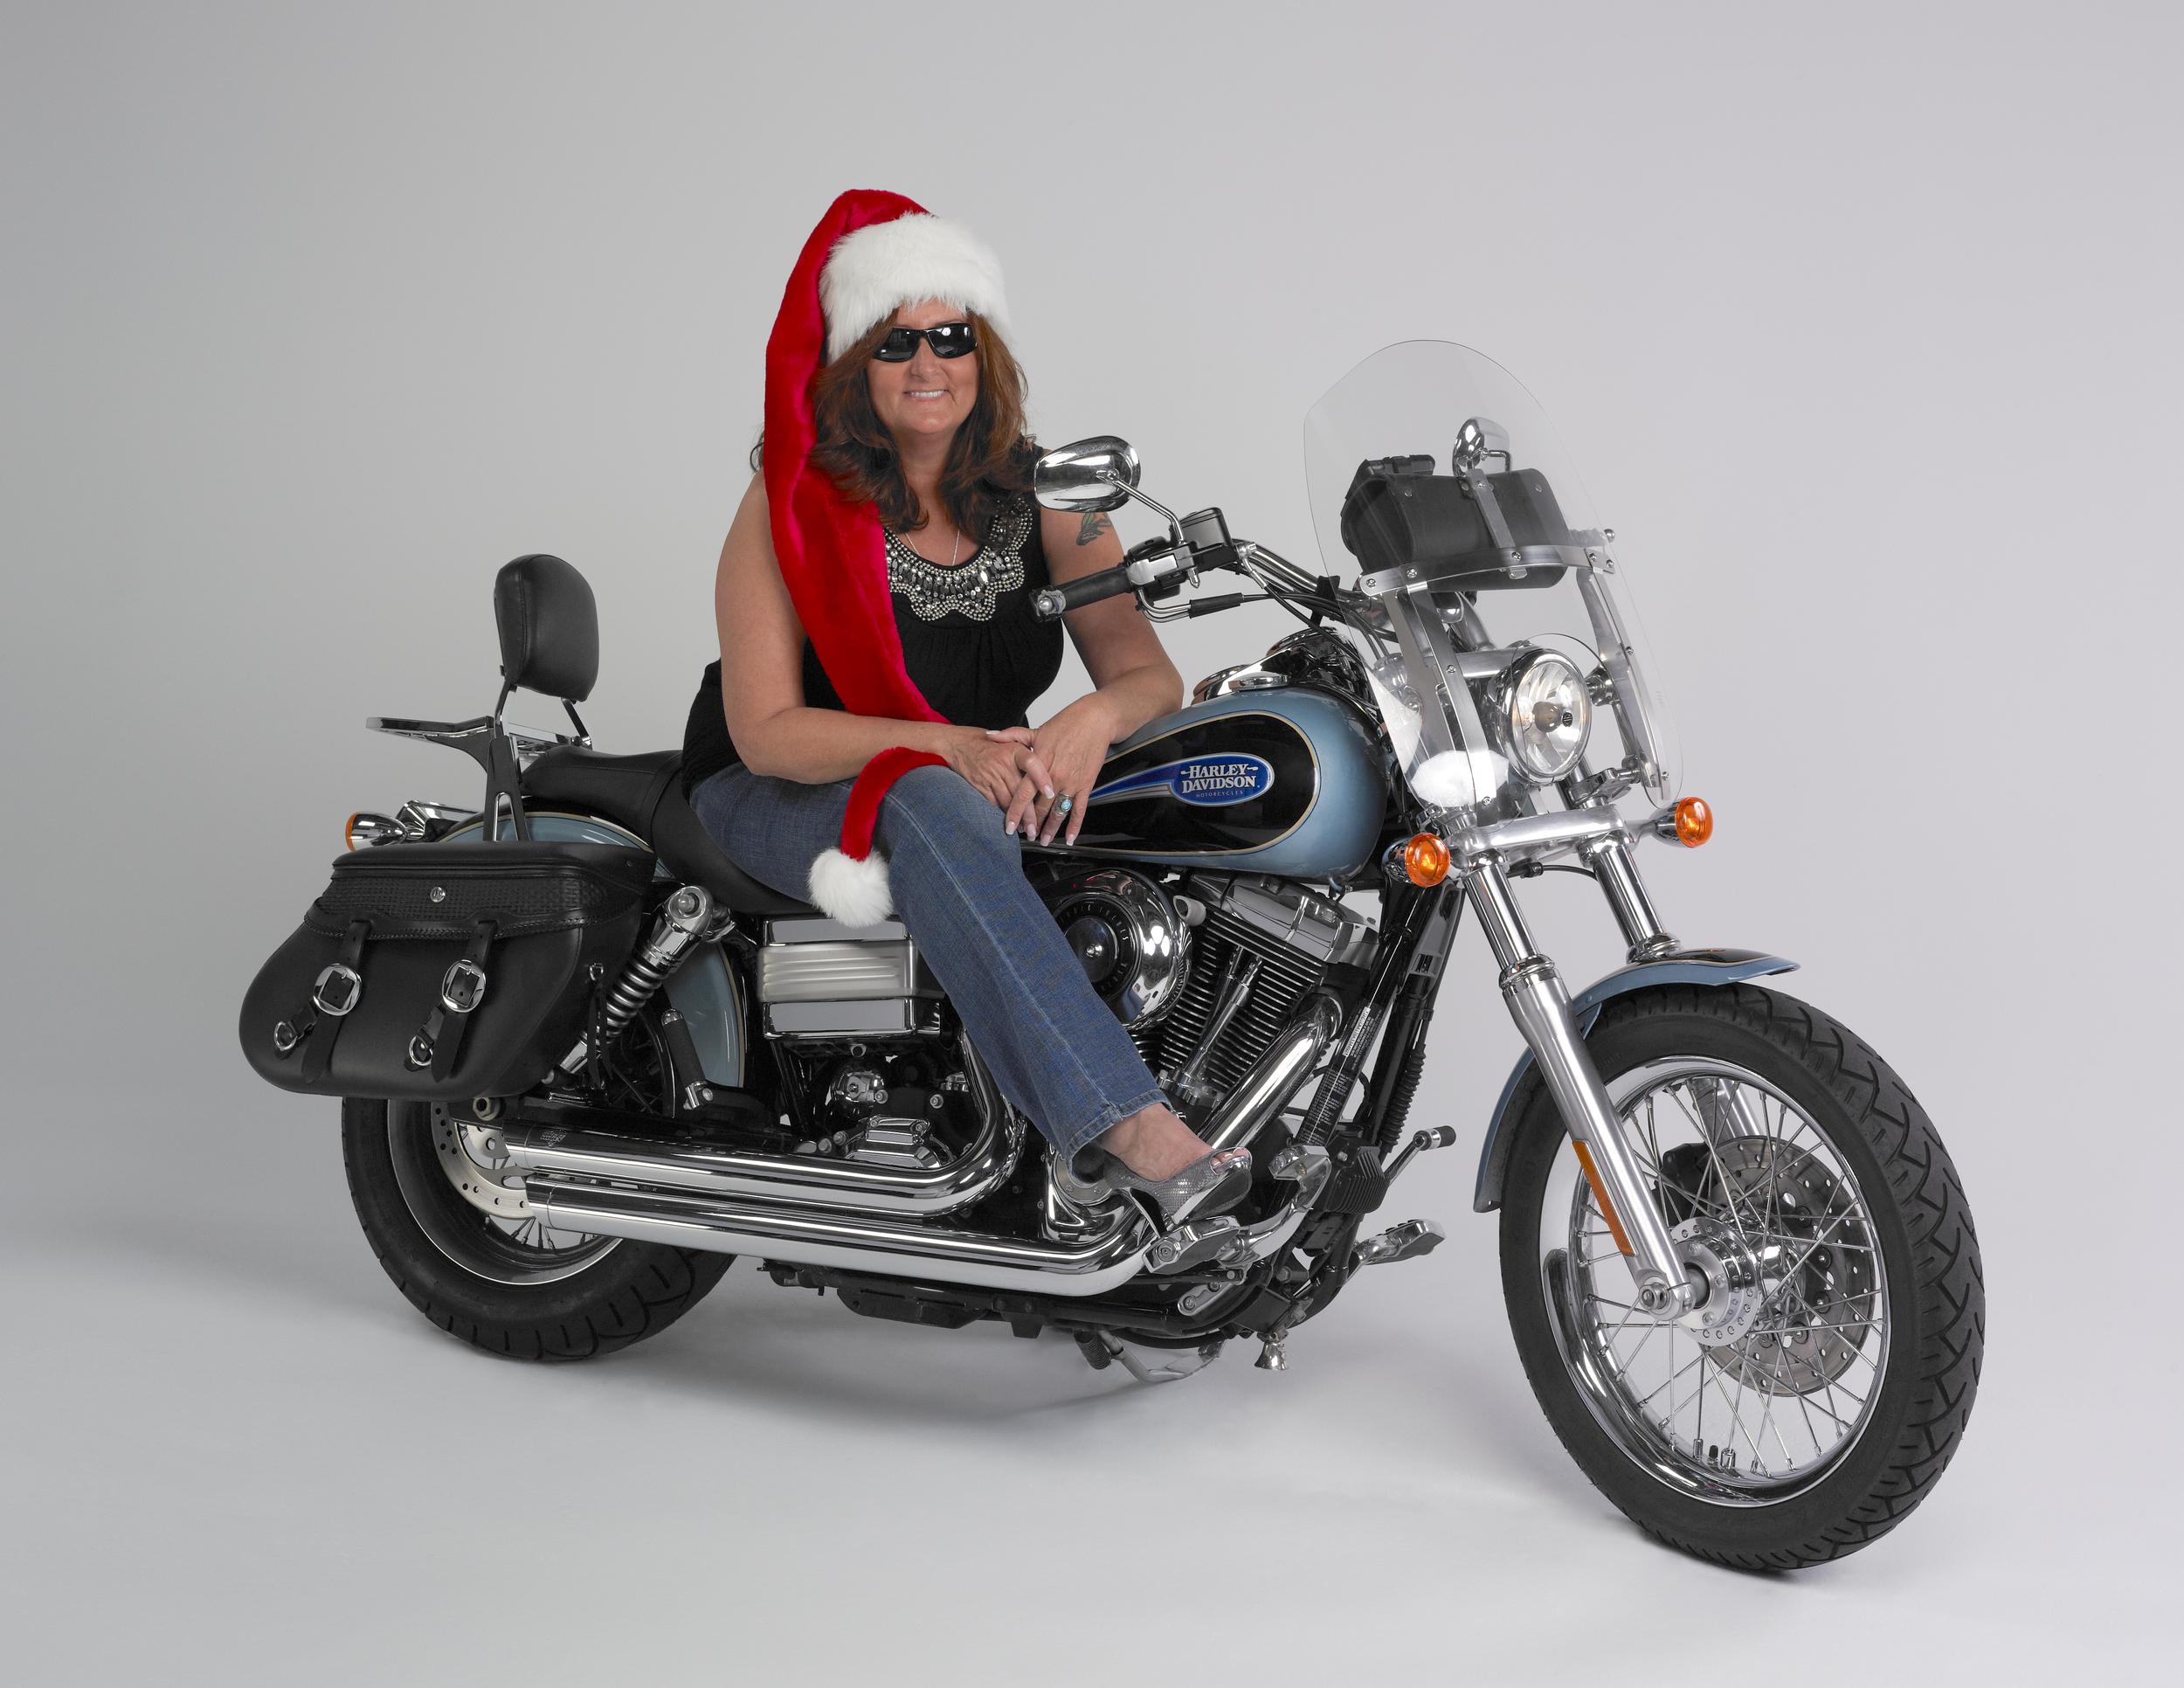 2014-09-30 Deb Marasco Harley0009201.jpg